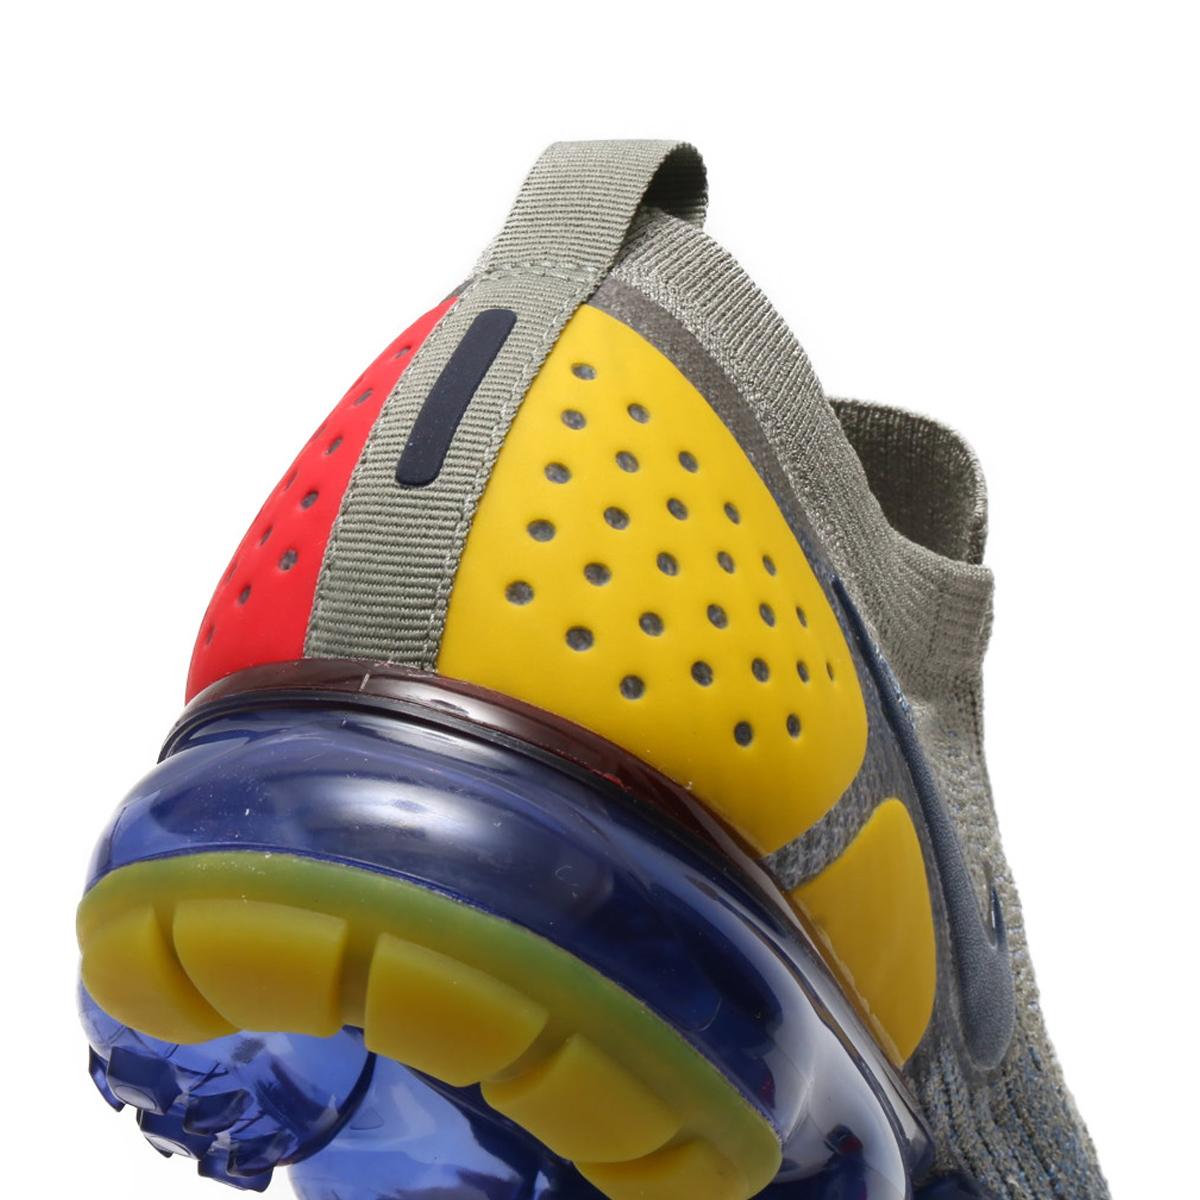 db7d62ceecb0 NIKE AIR VAPORMAX FK MOC 2 (Nike air vapor max fried food knit mock 2) DARK  STUCCO MIDNIGHT NAVY-OCEAN FOG 18SU-S